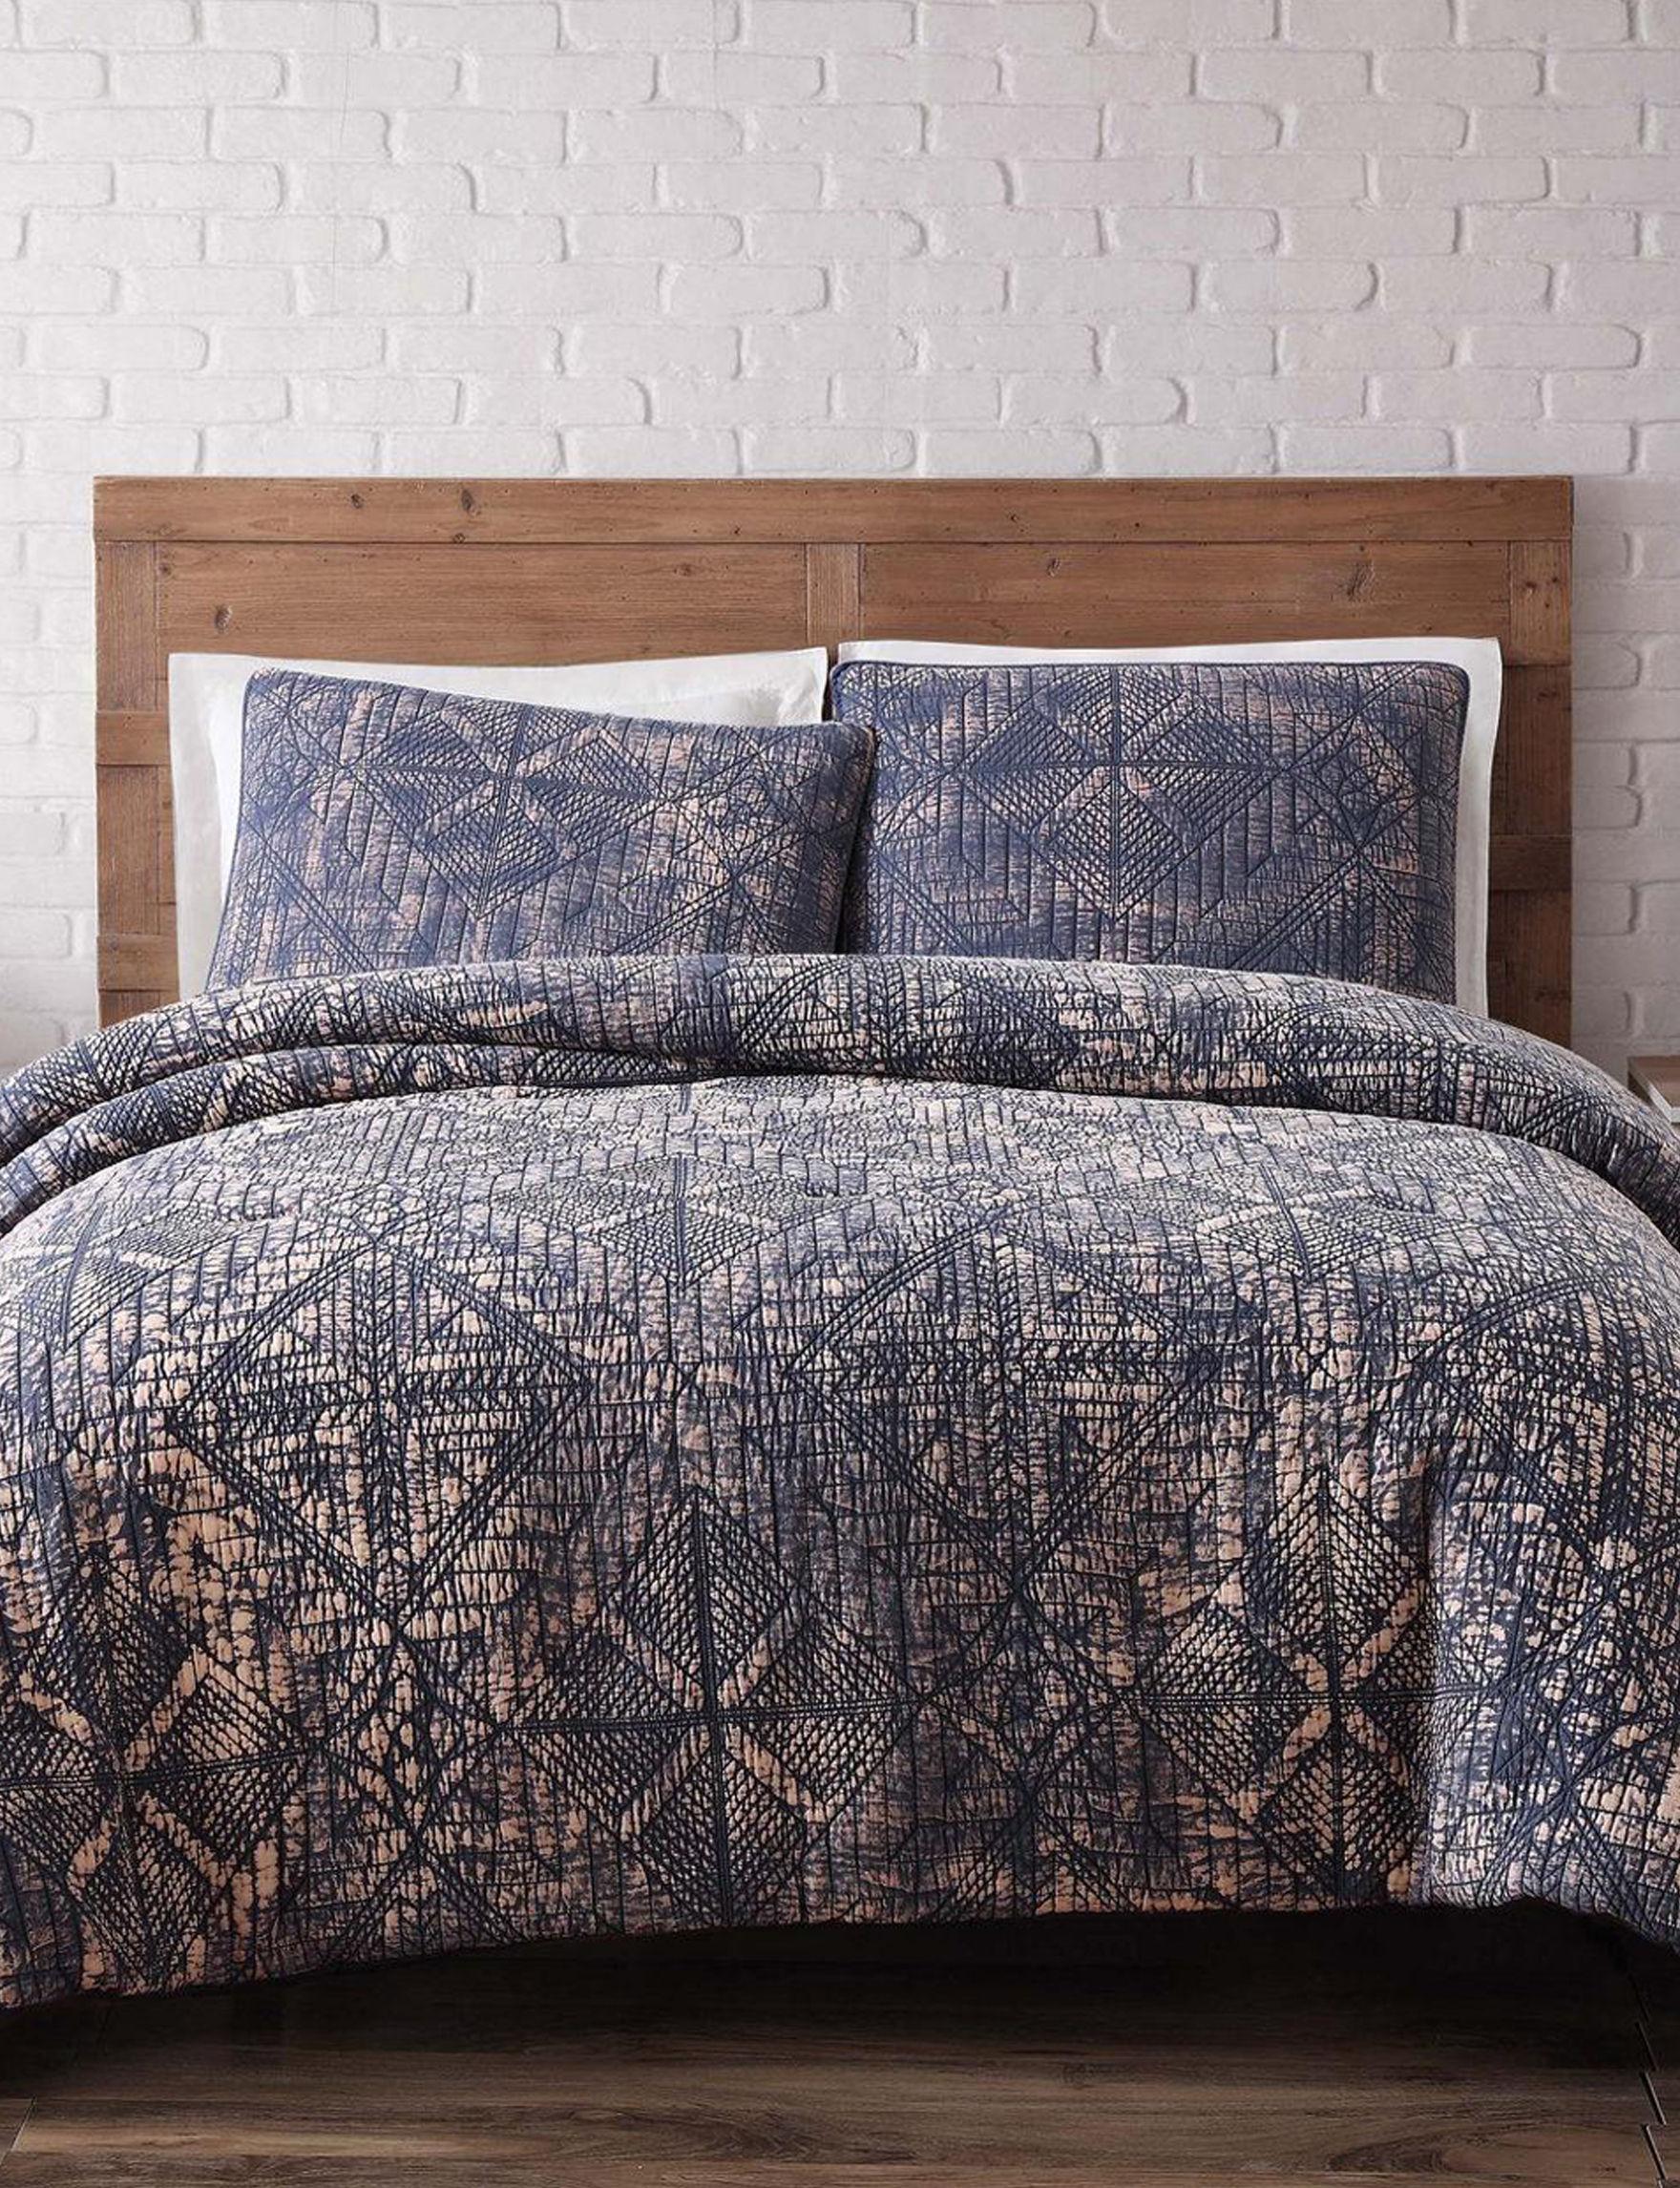 Brooklyn Loom Blue Comforters & Comforter Sets